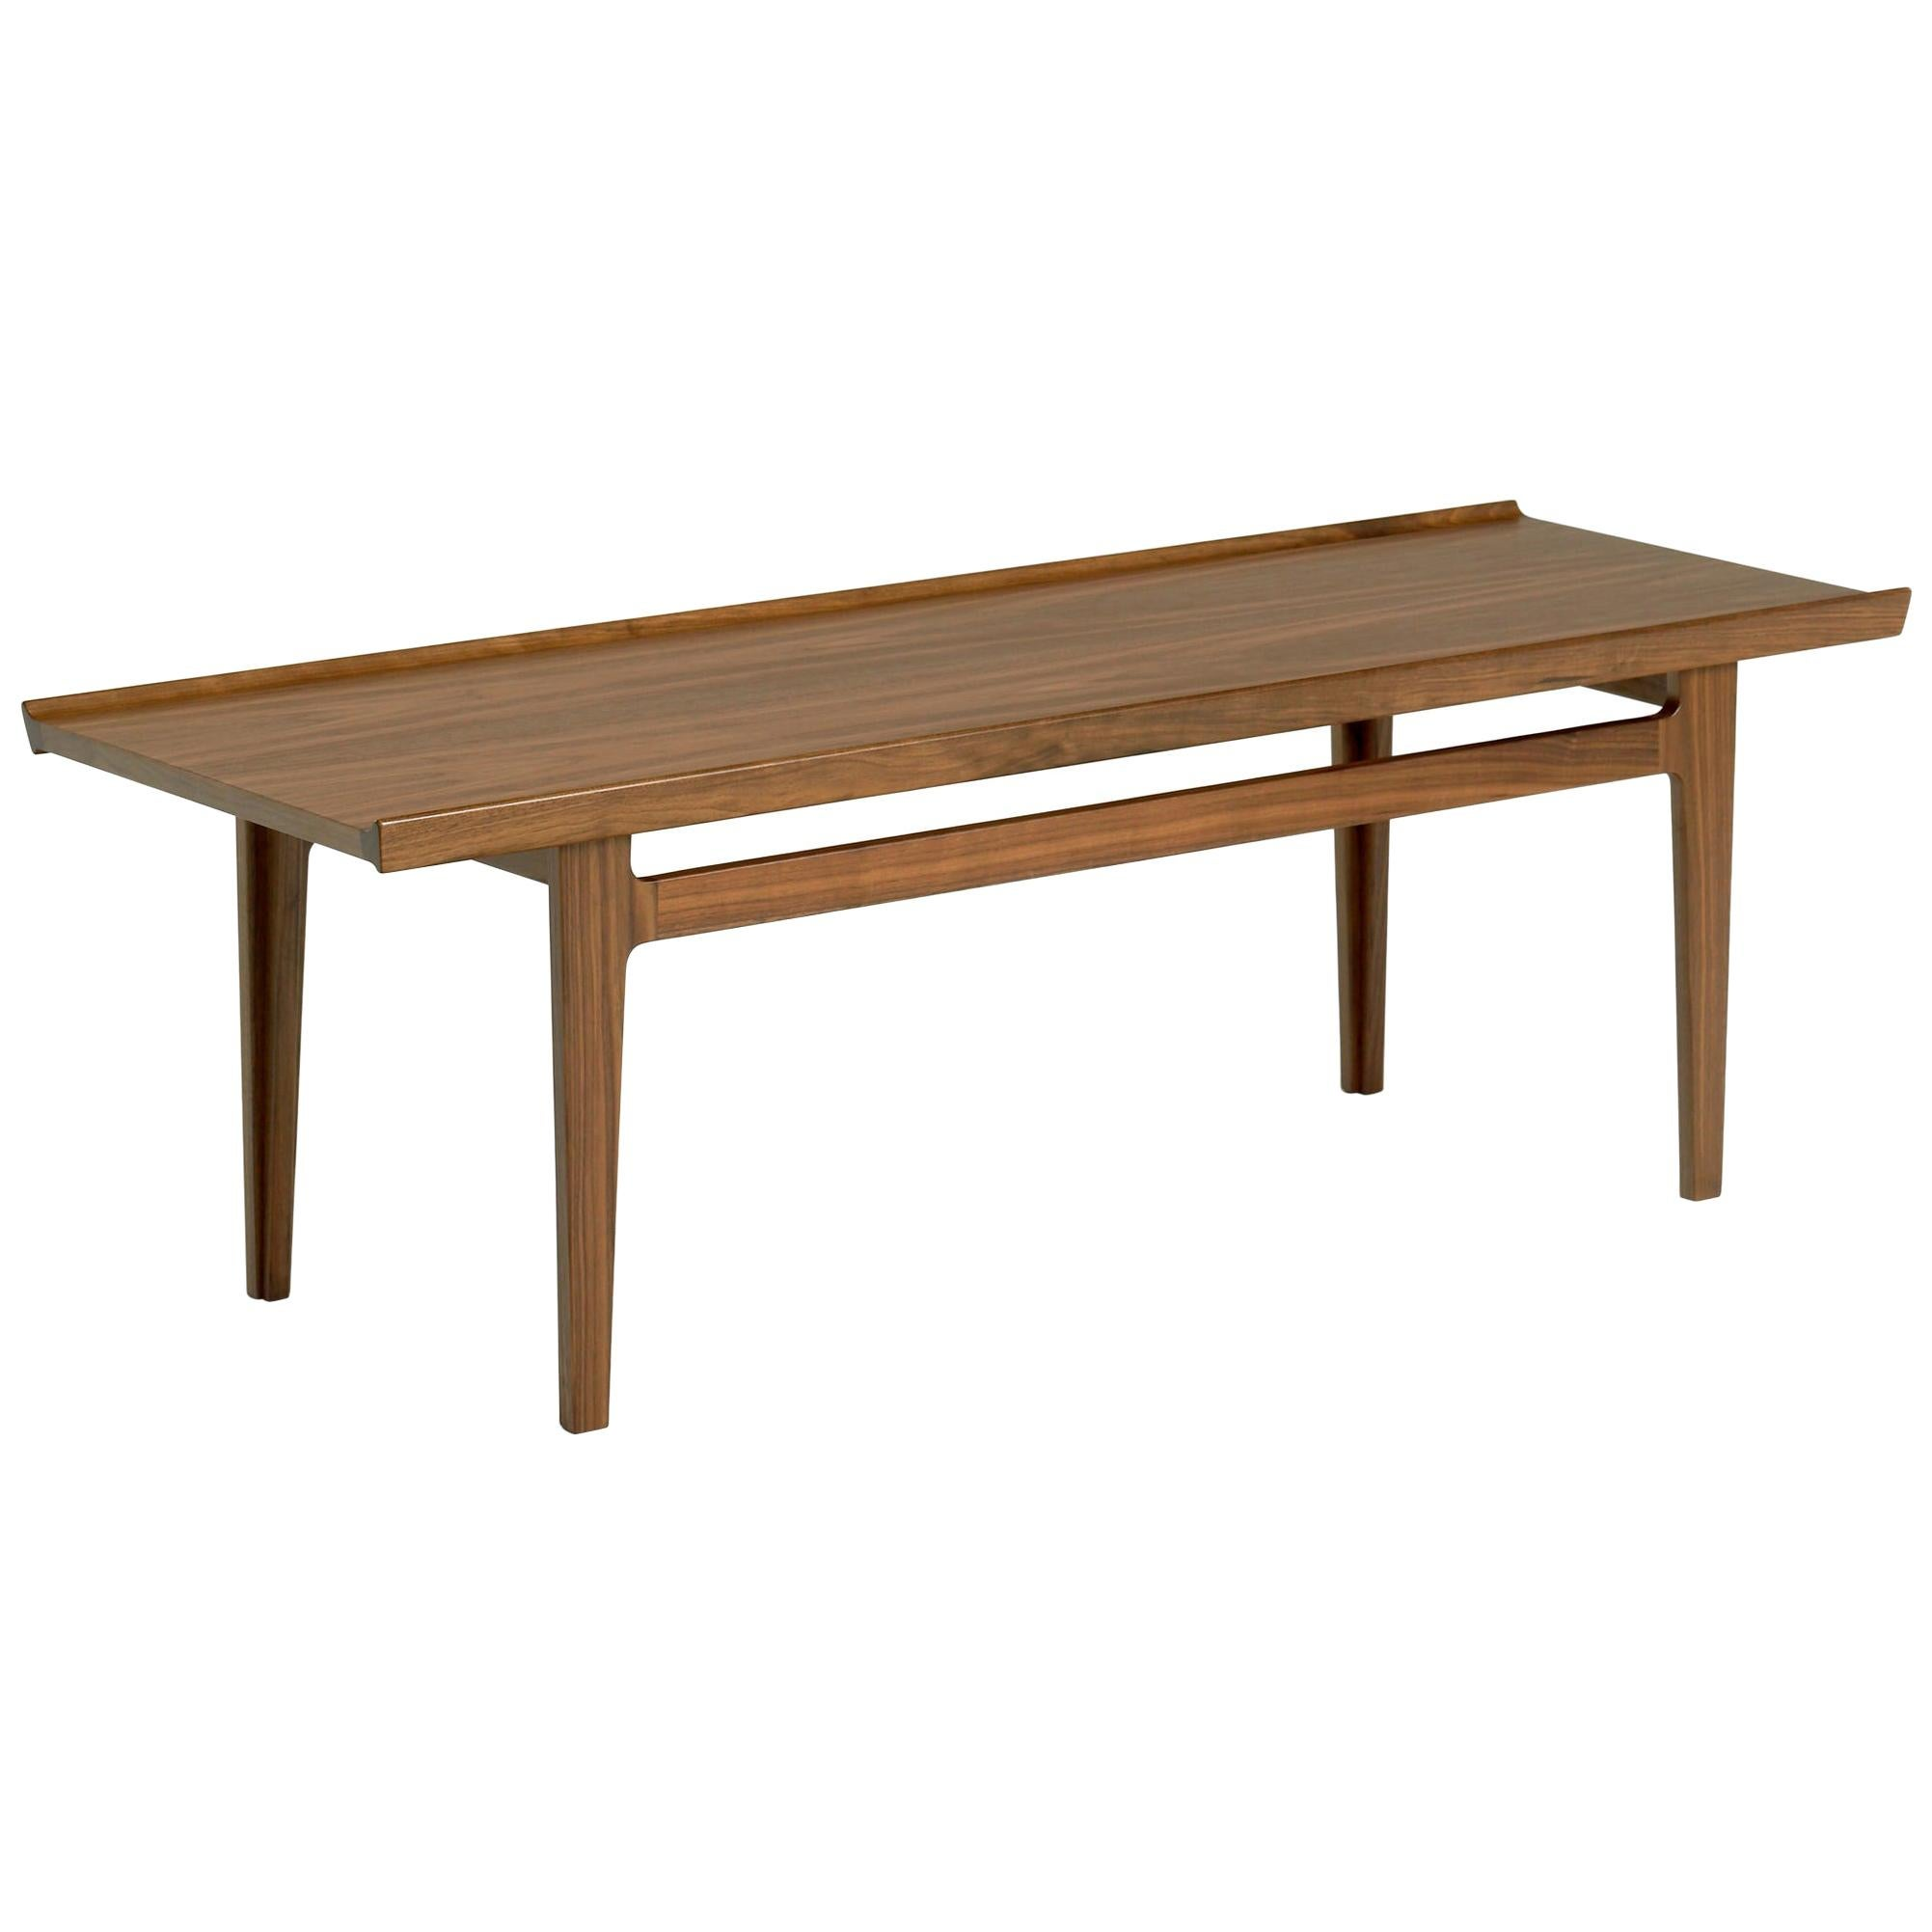 Finn Juhl 500 Wood Table Long Version